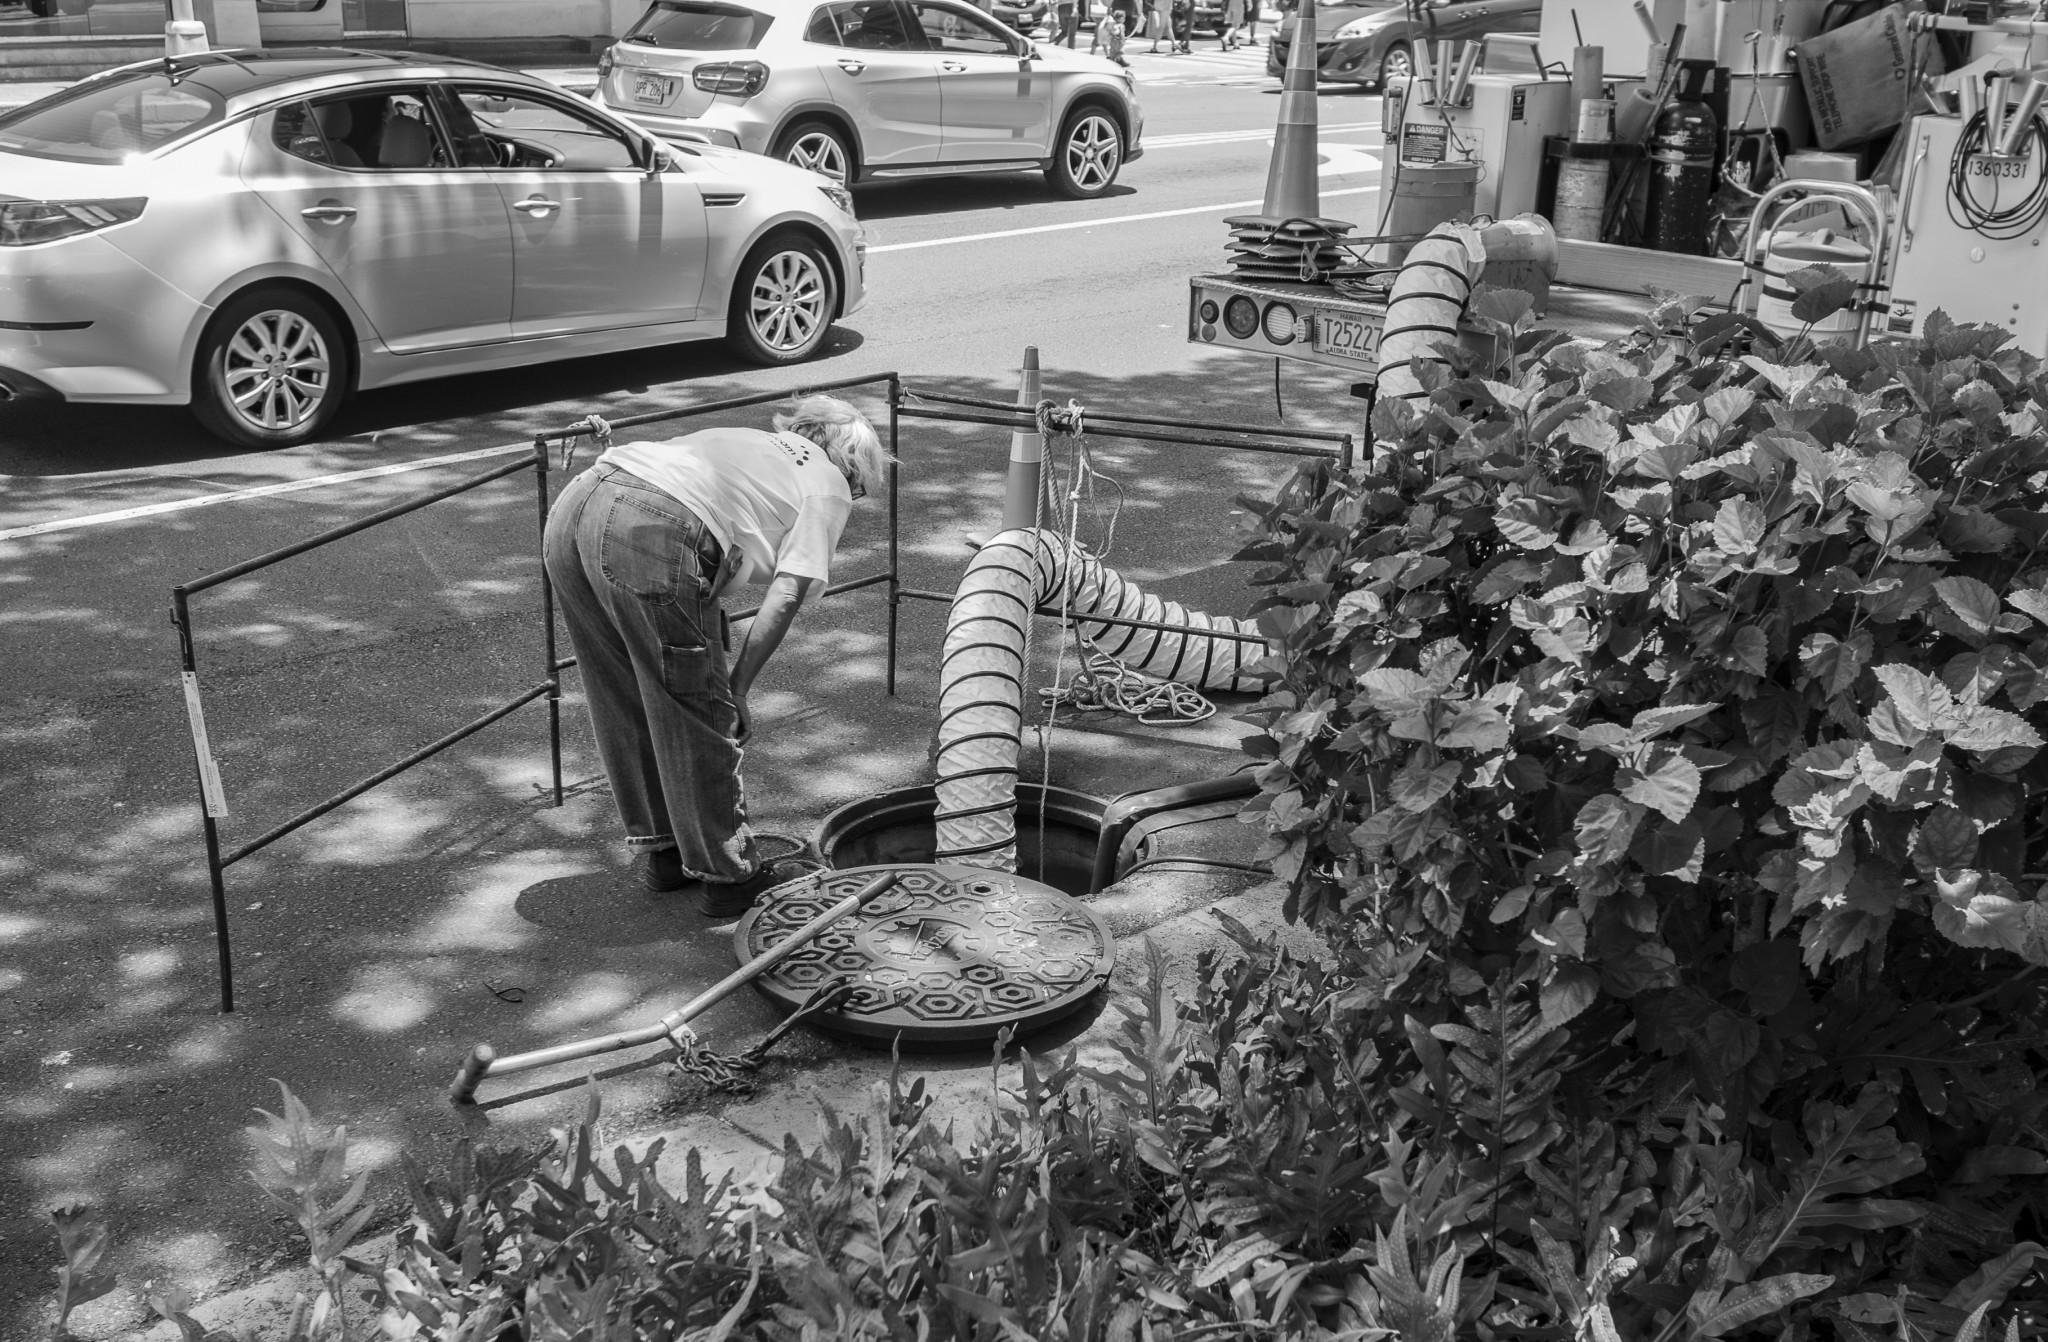 <p>A Hawaiian Telcom employee peered down an open manhole as utility work was done on Keeaumoku Street.</p>